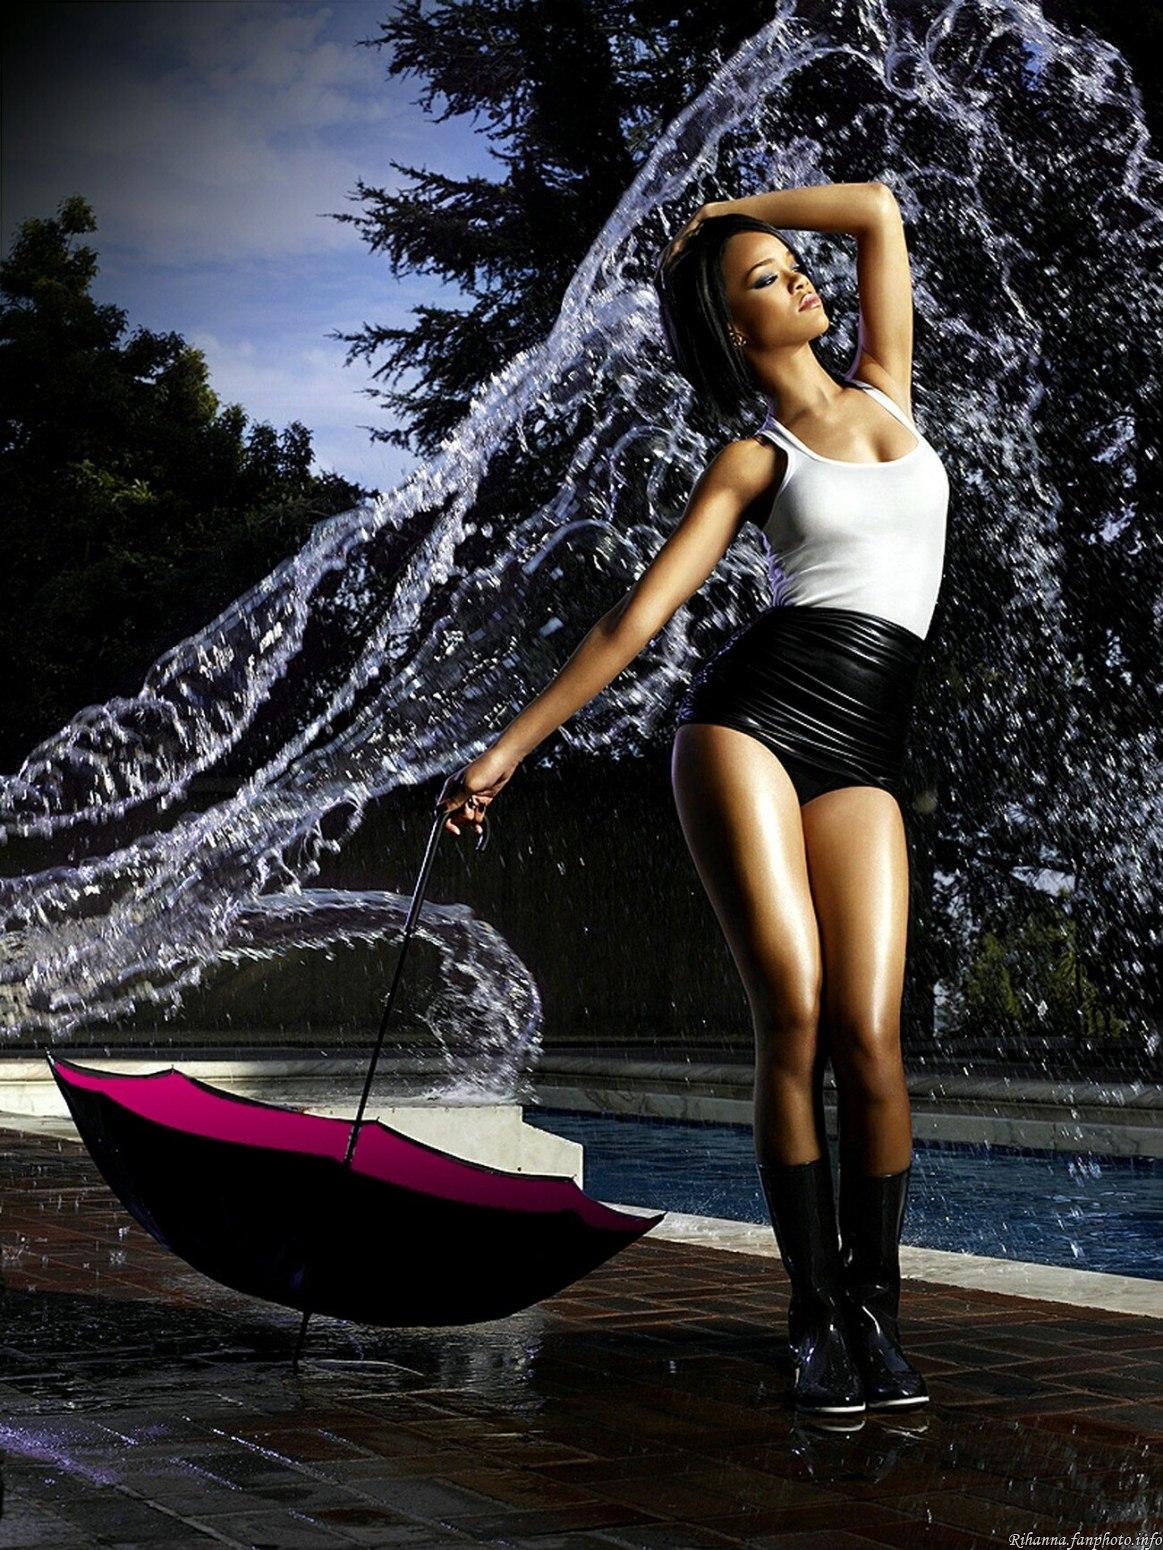 http://2.bp.blogspot.com/_2TT5MNDJSDg/TNYnO42K4NI/AAAAAAAAAd0/ZqjyVVMPWcg/s1600/rihanna_umbrella_poster_0011.jpg